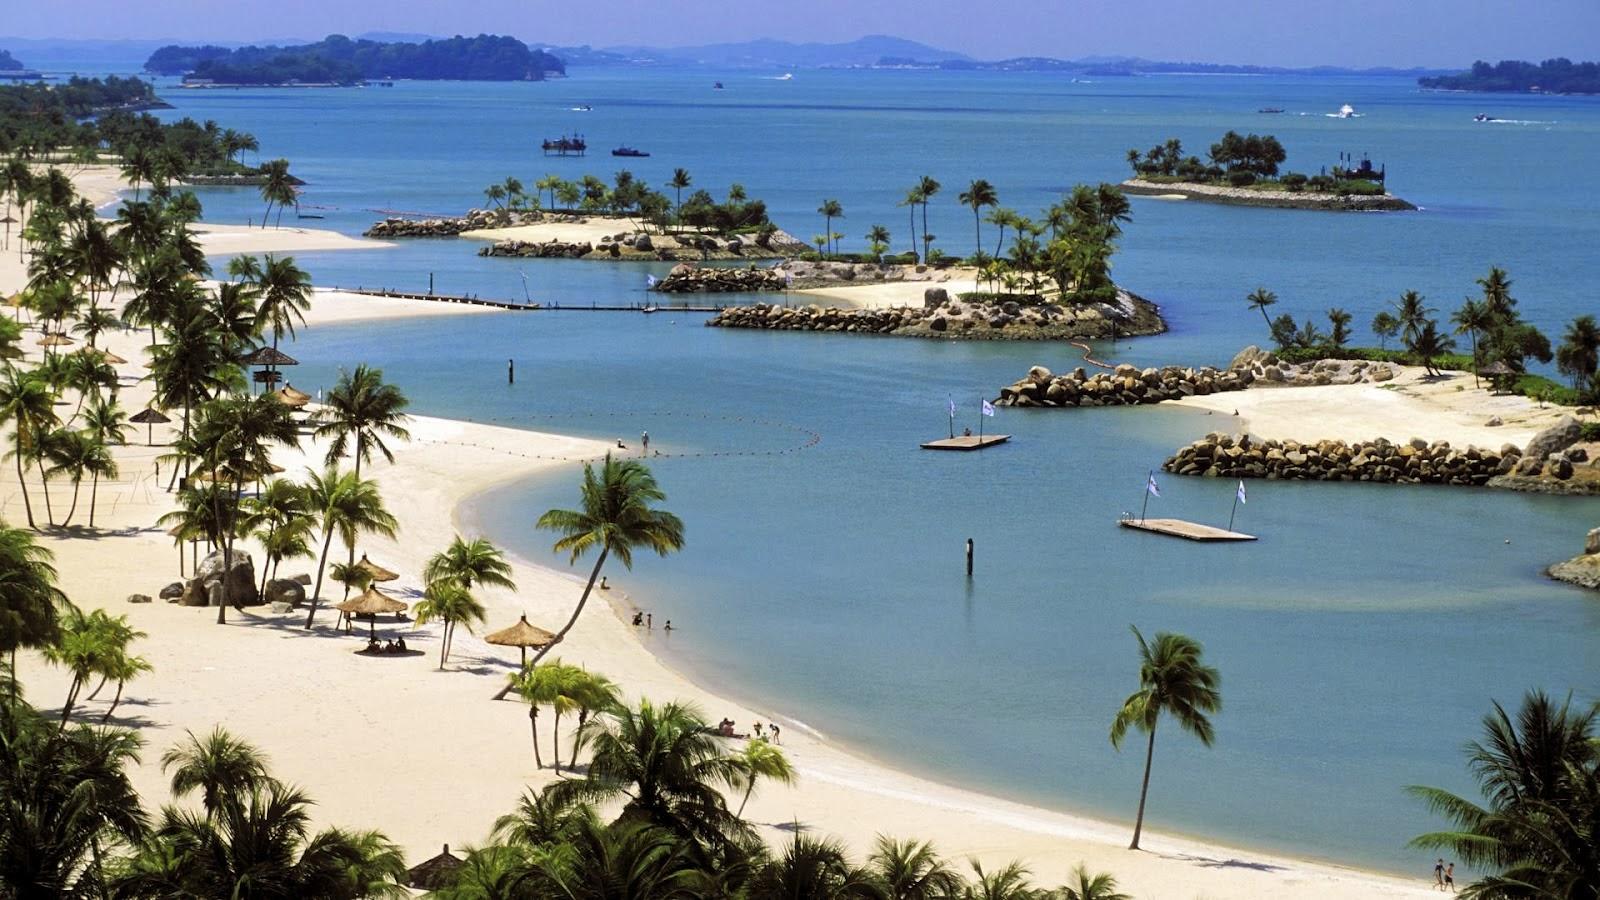 Singapore Ísland: พูเลา อูบิน (Pulau Ubin)